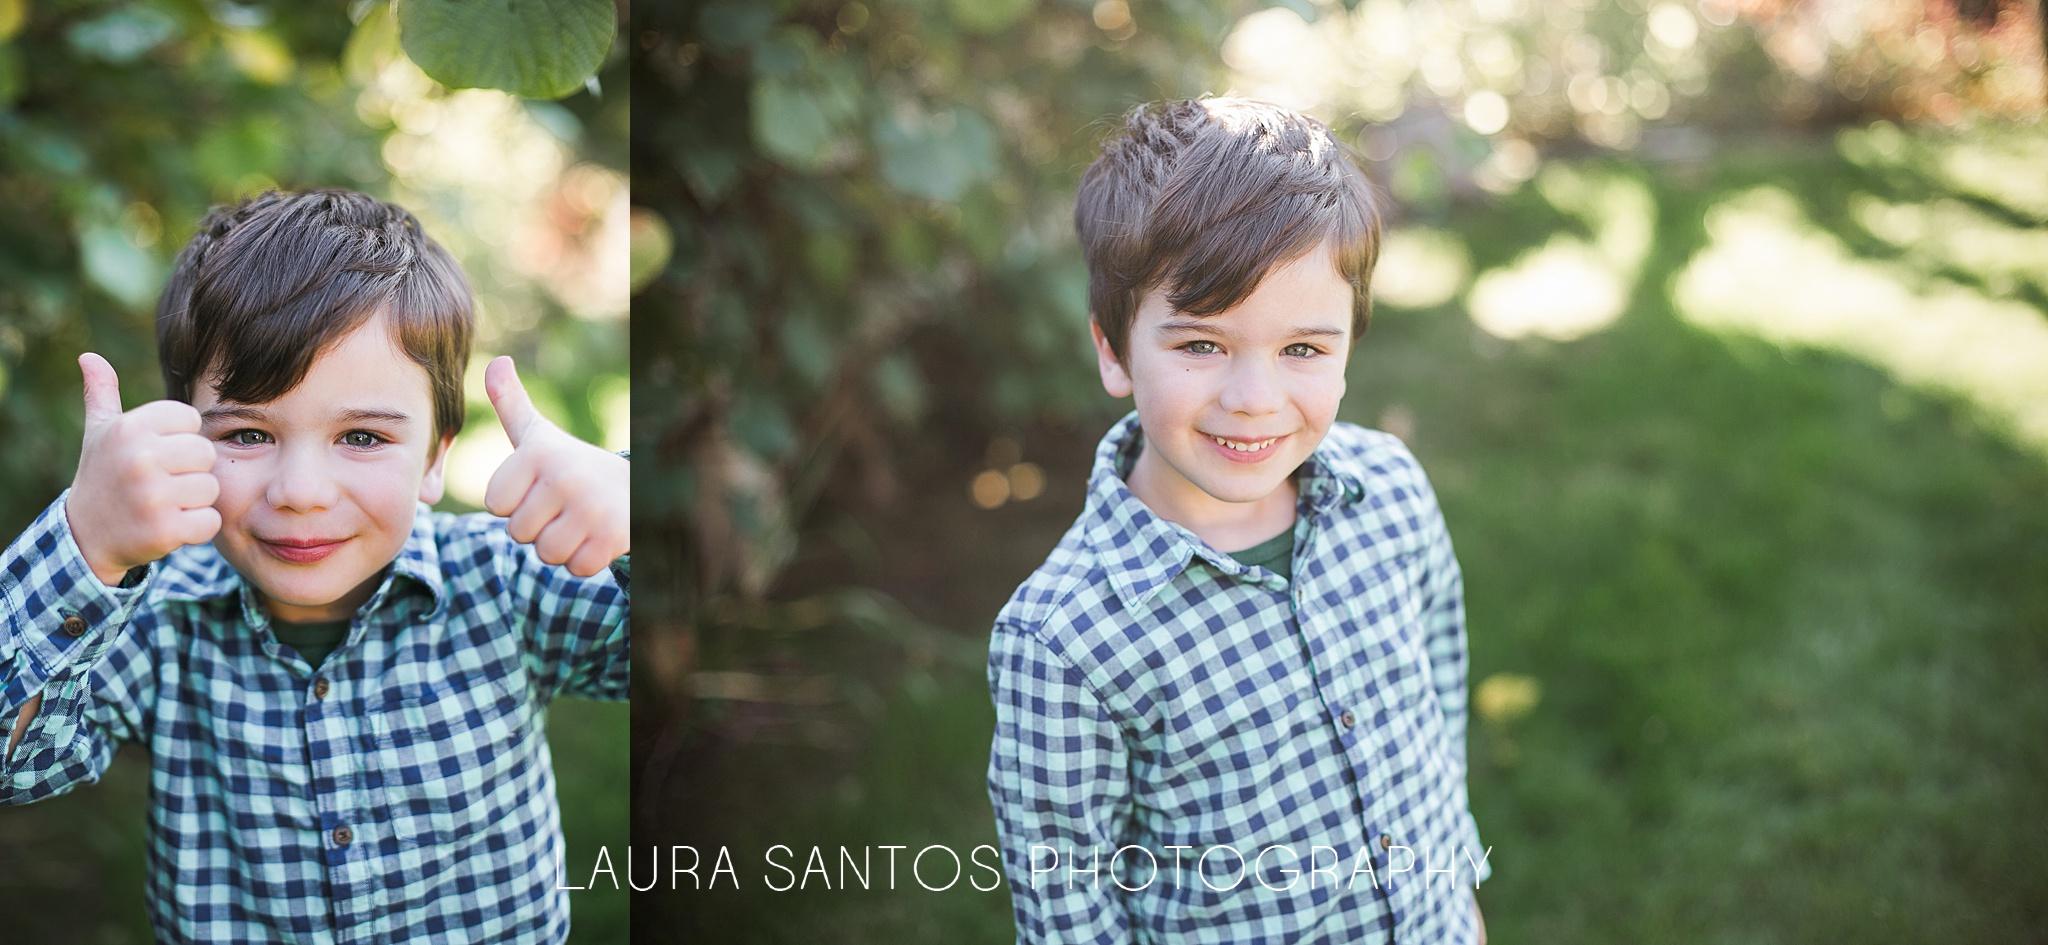 Laura Santos Photography Portland Oregon Family Photographer_0828.jpg